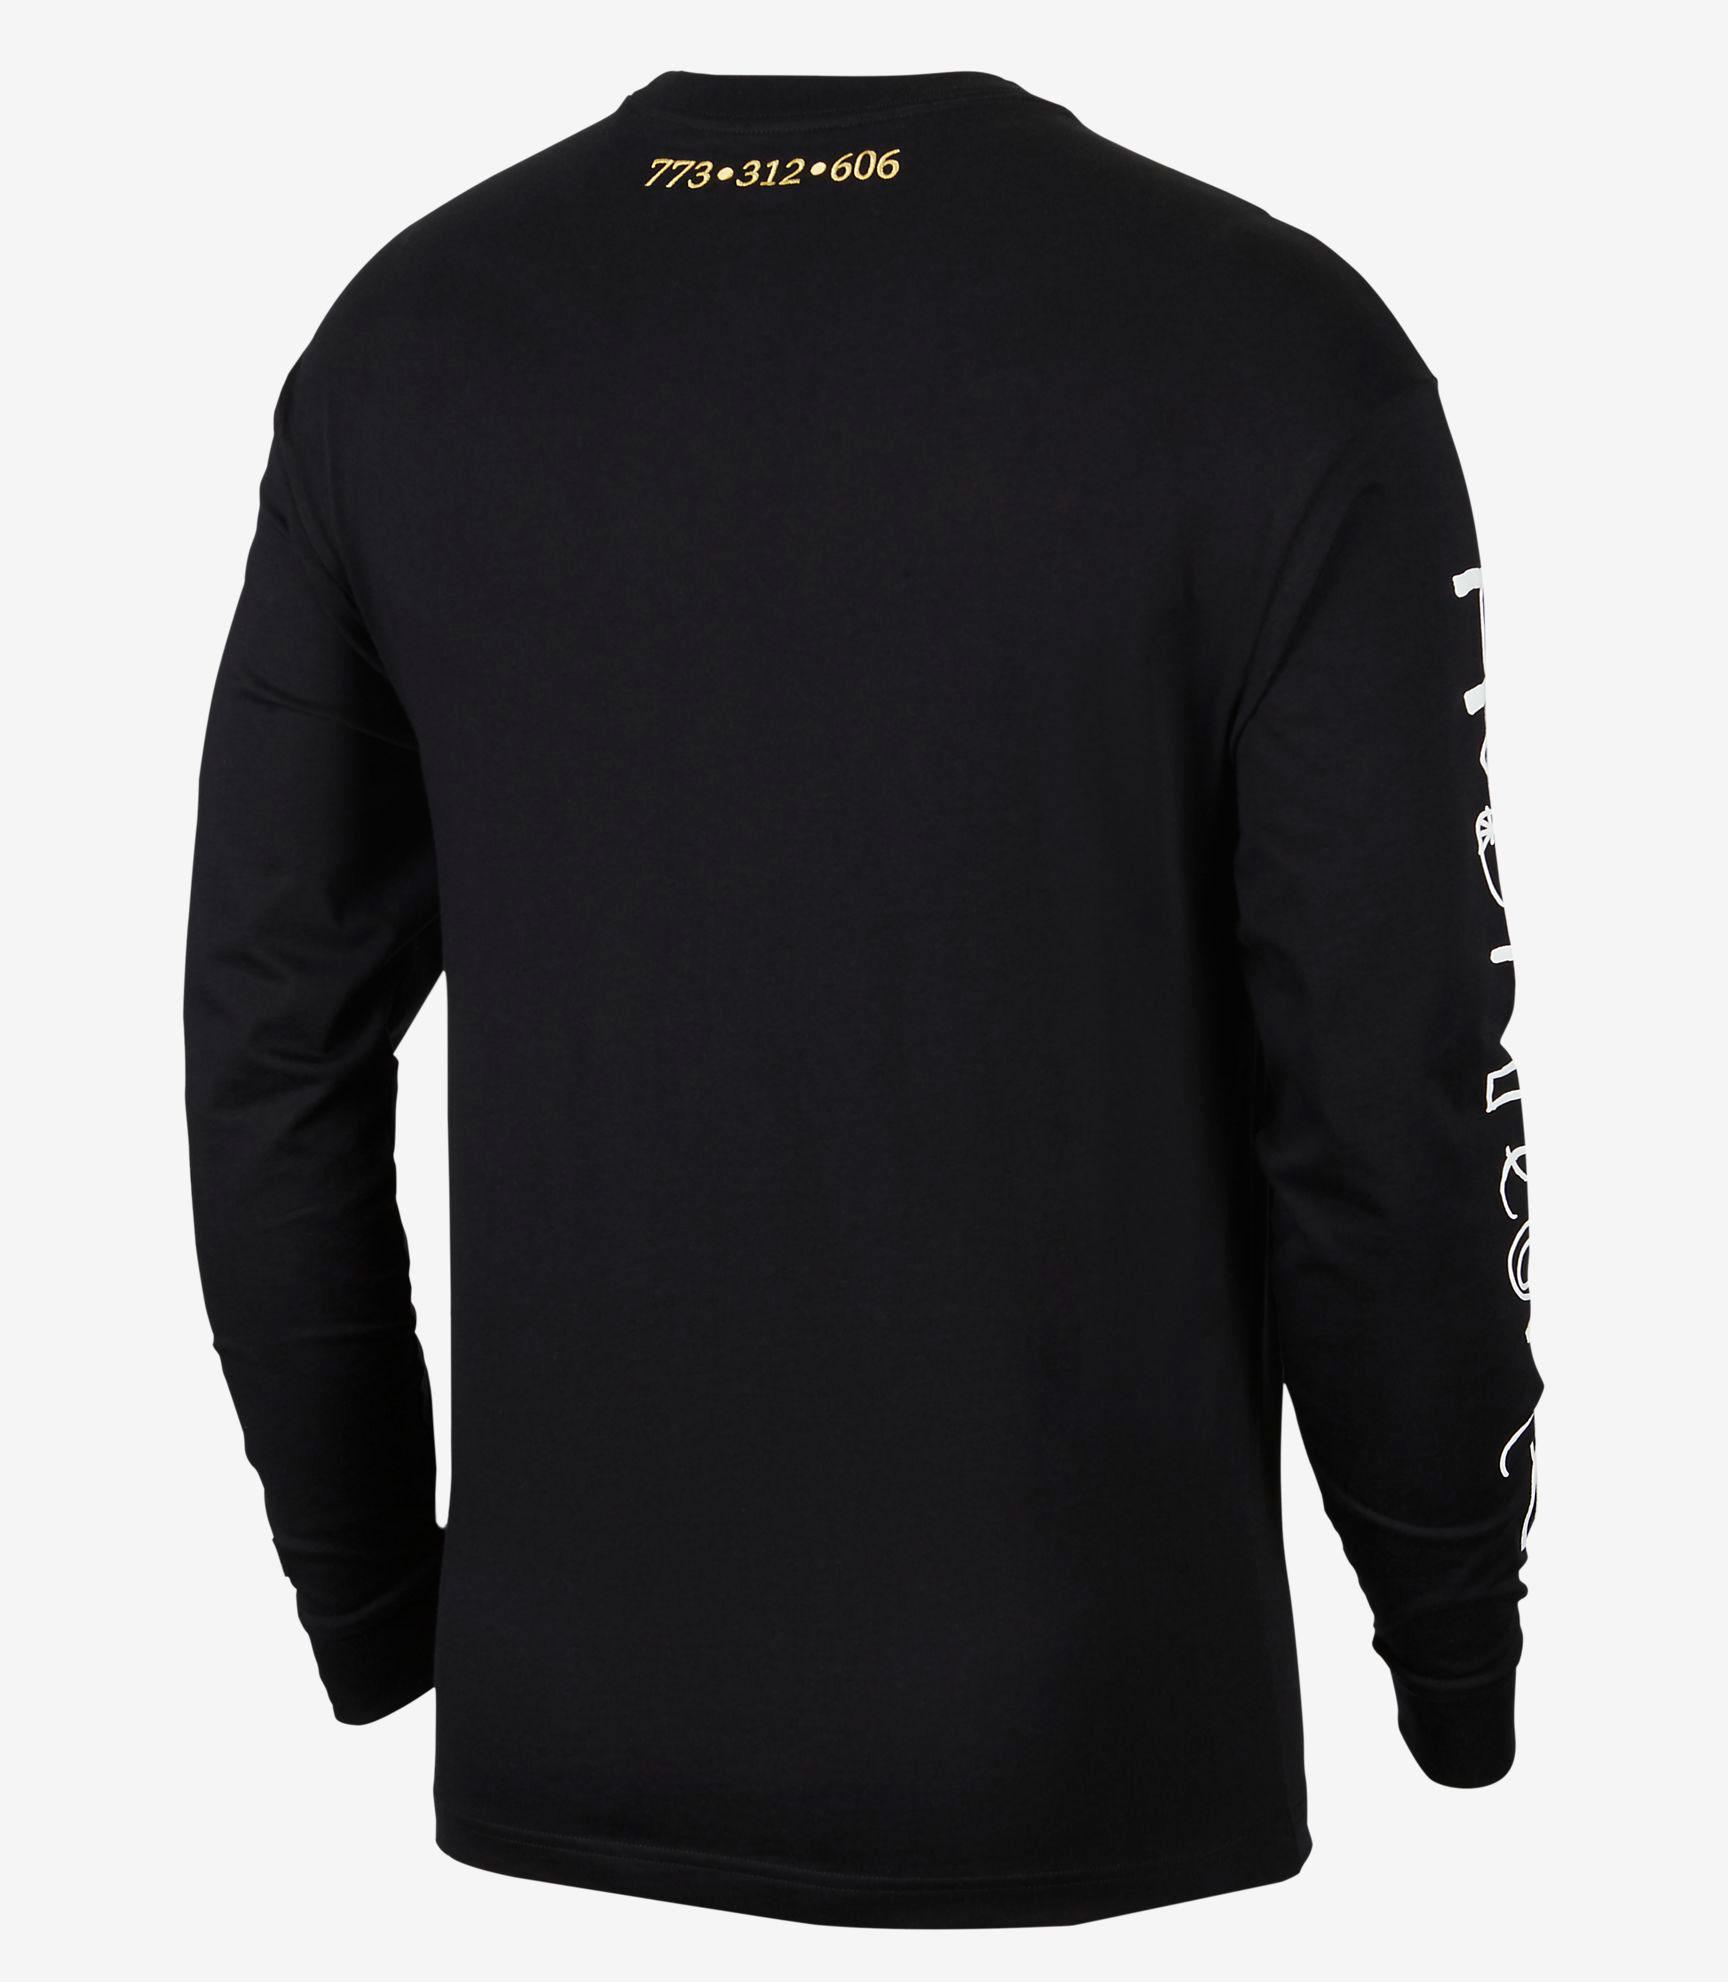 jordan-socialworks-chicago-shirt-2